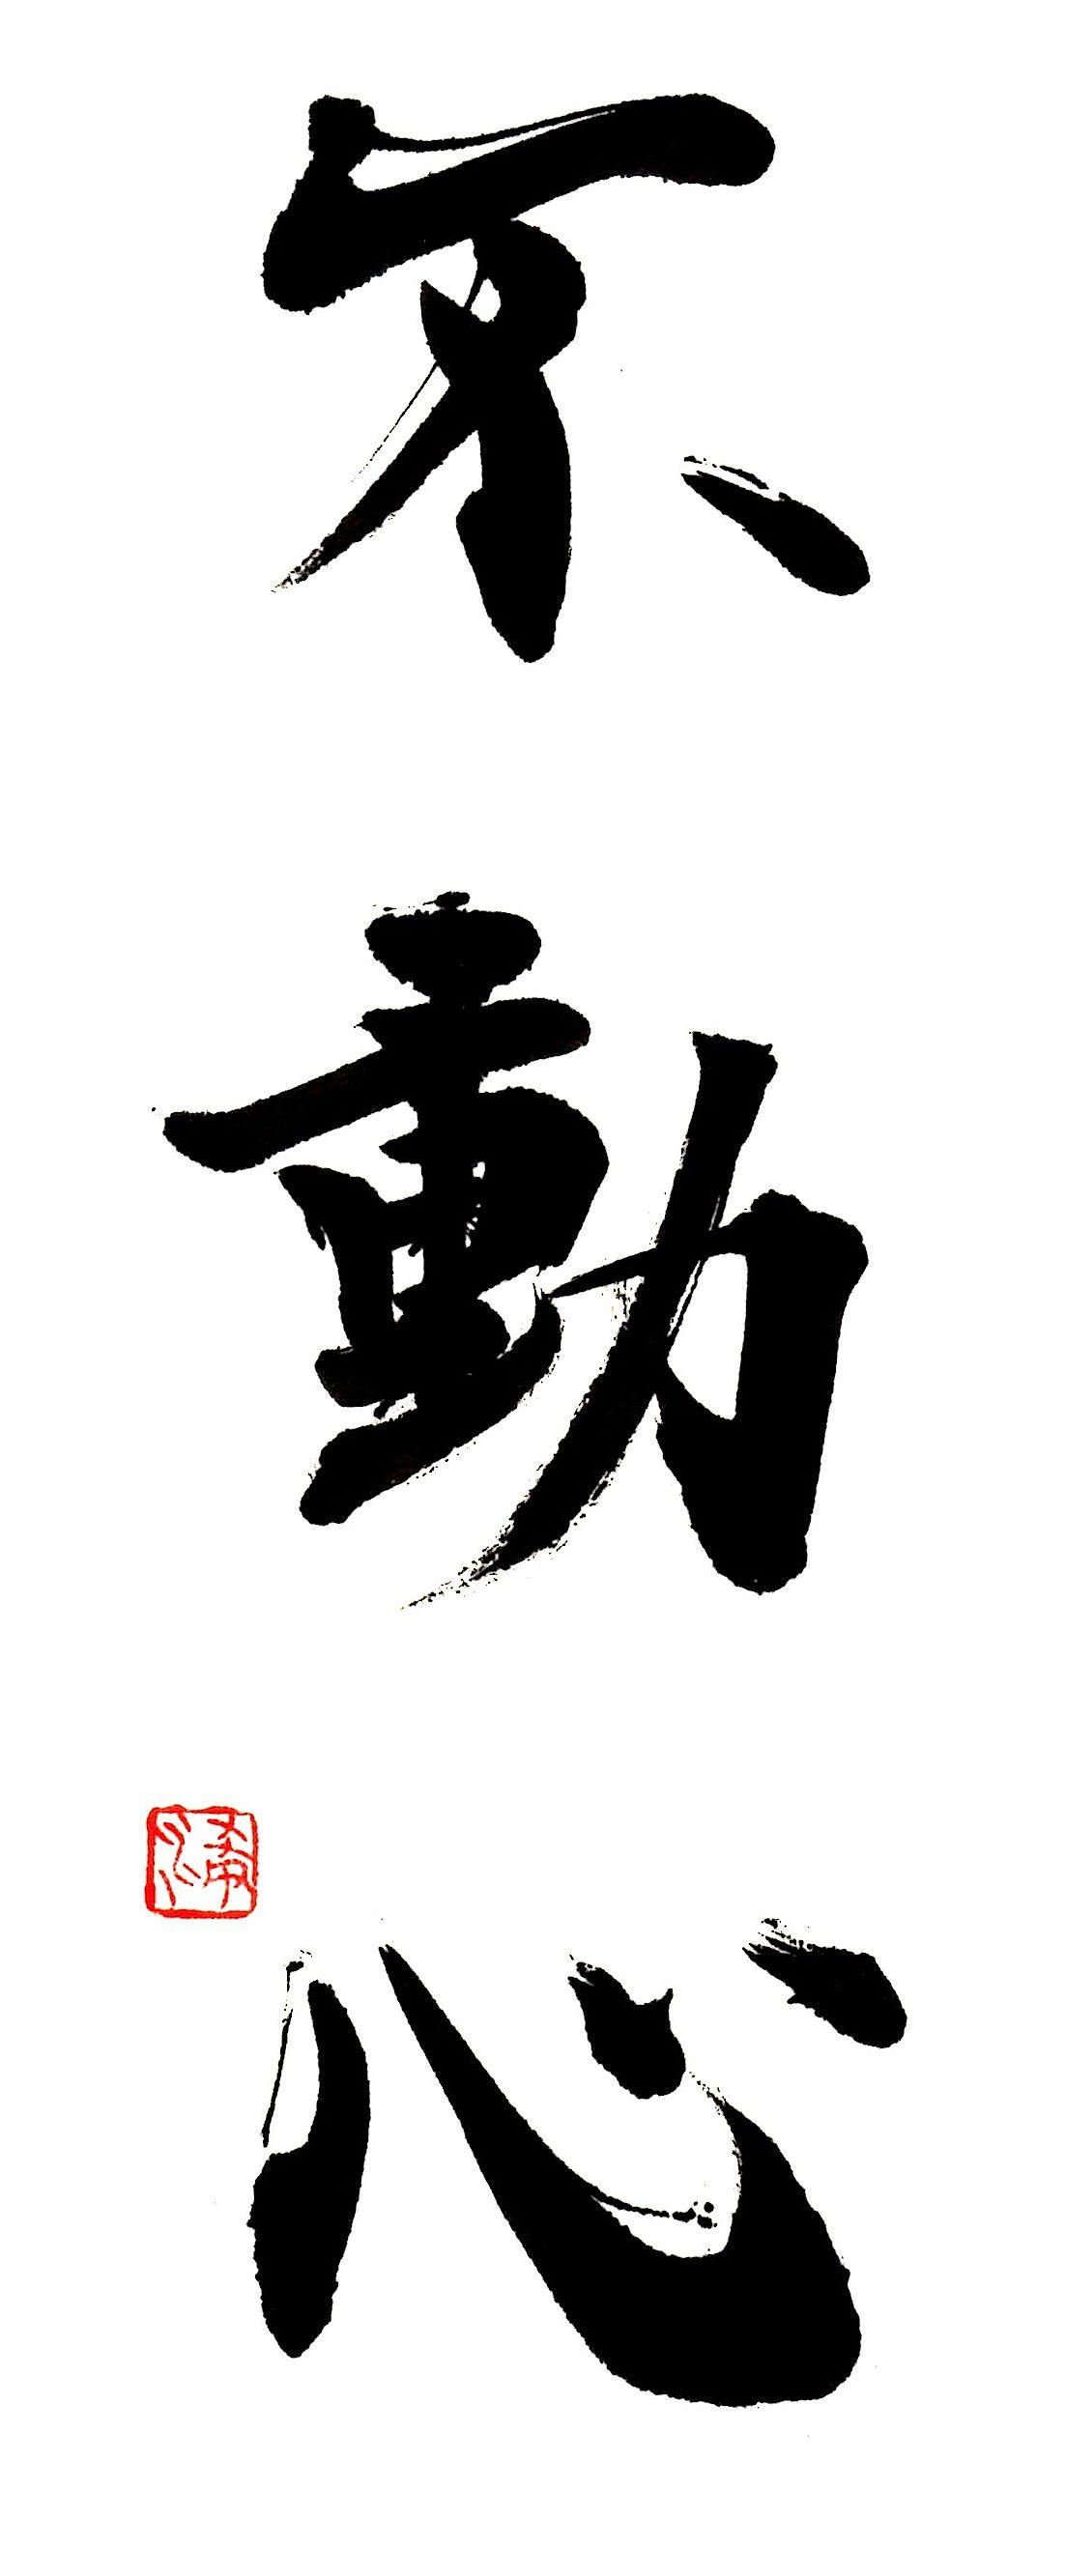 Gallery 筆文字 文字デザイン 習字